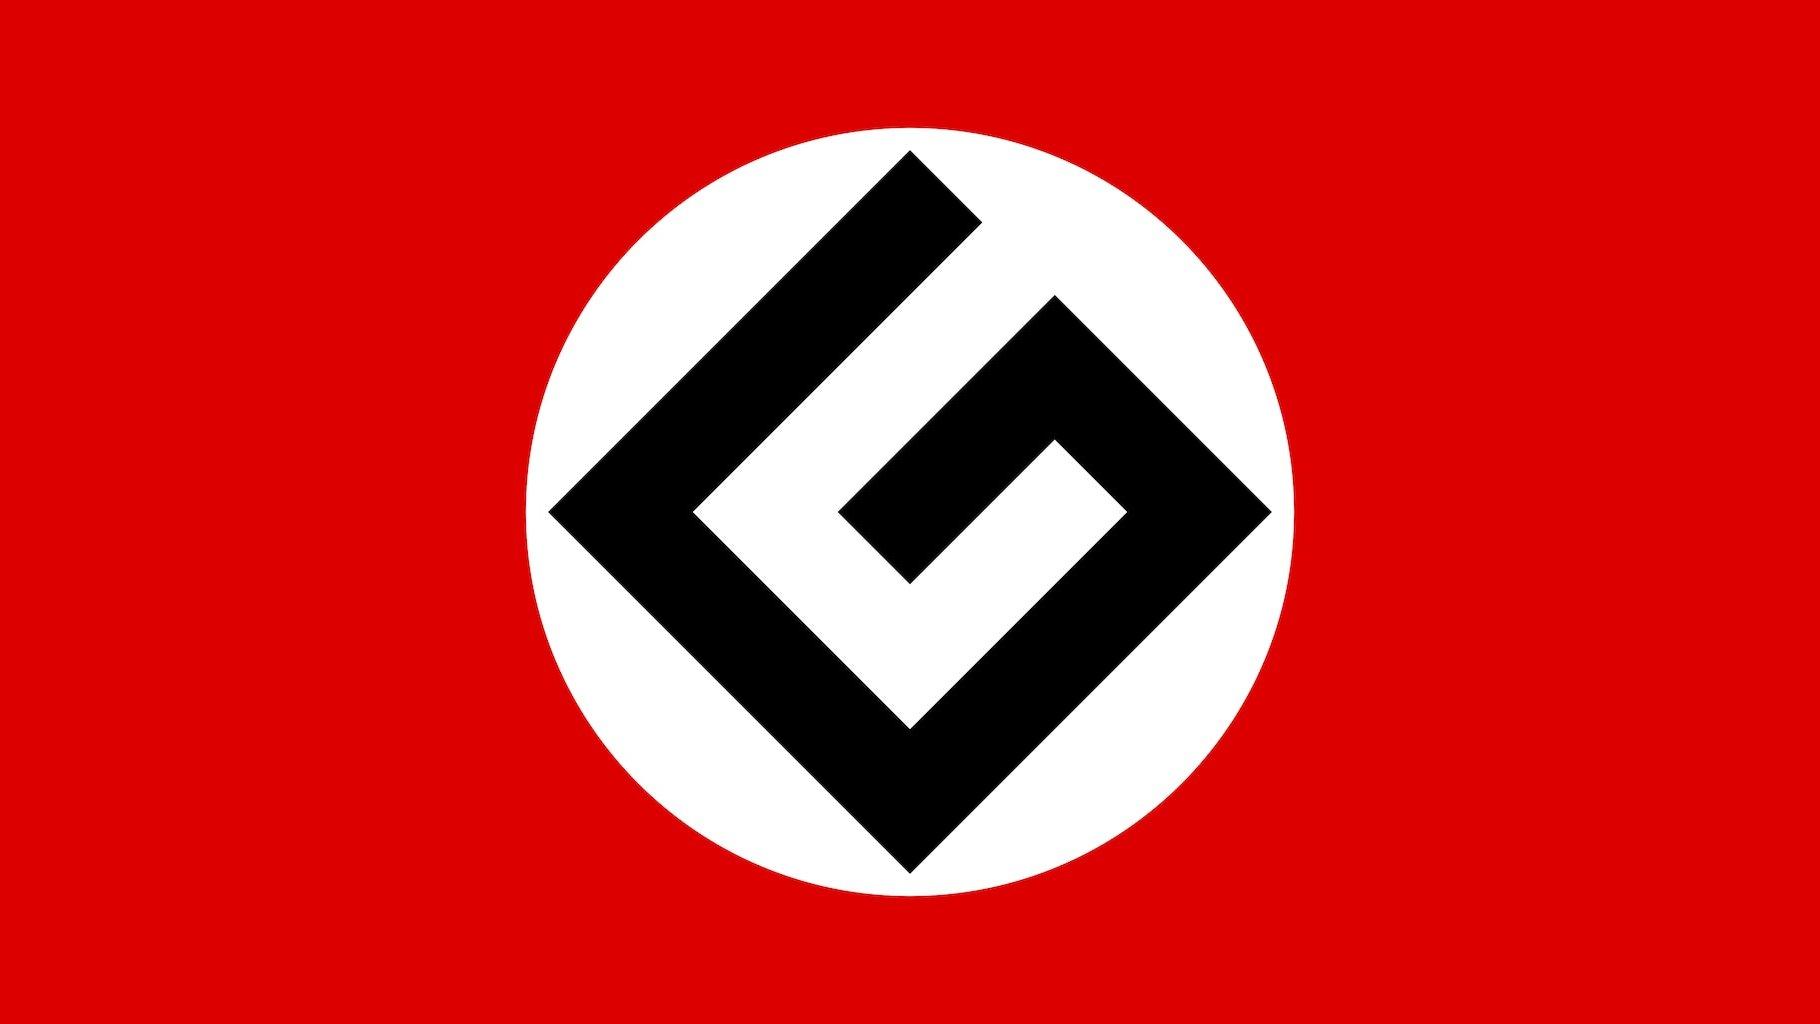 Grammar Nazi Image Gallery List View Know Your Meme